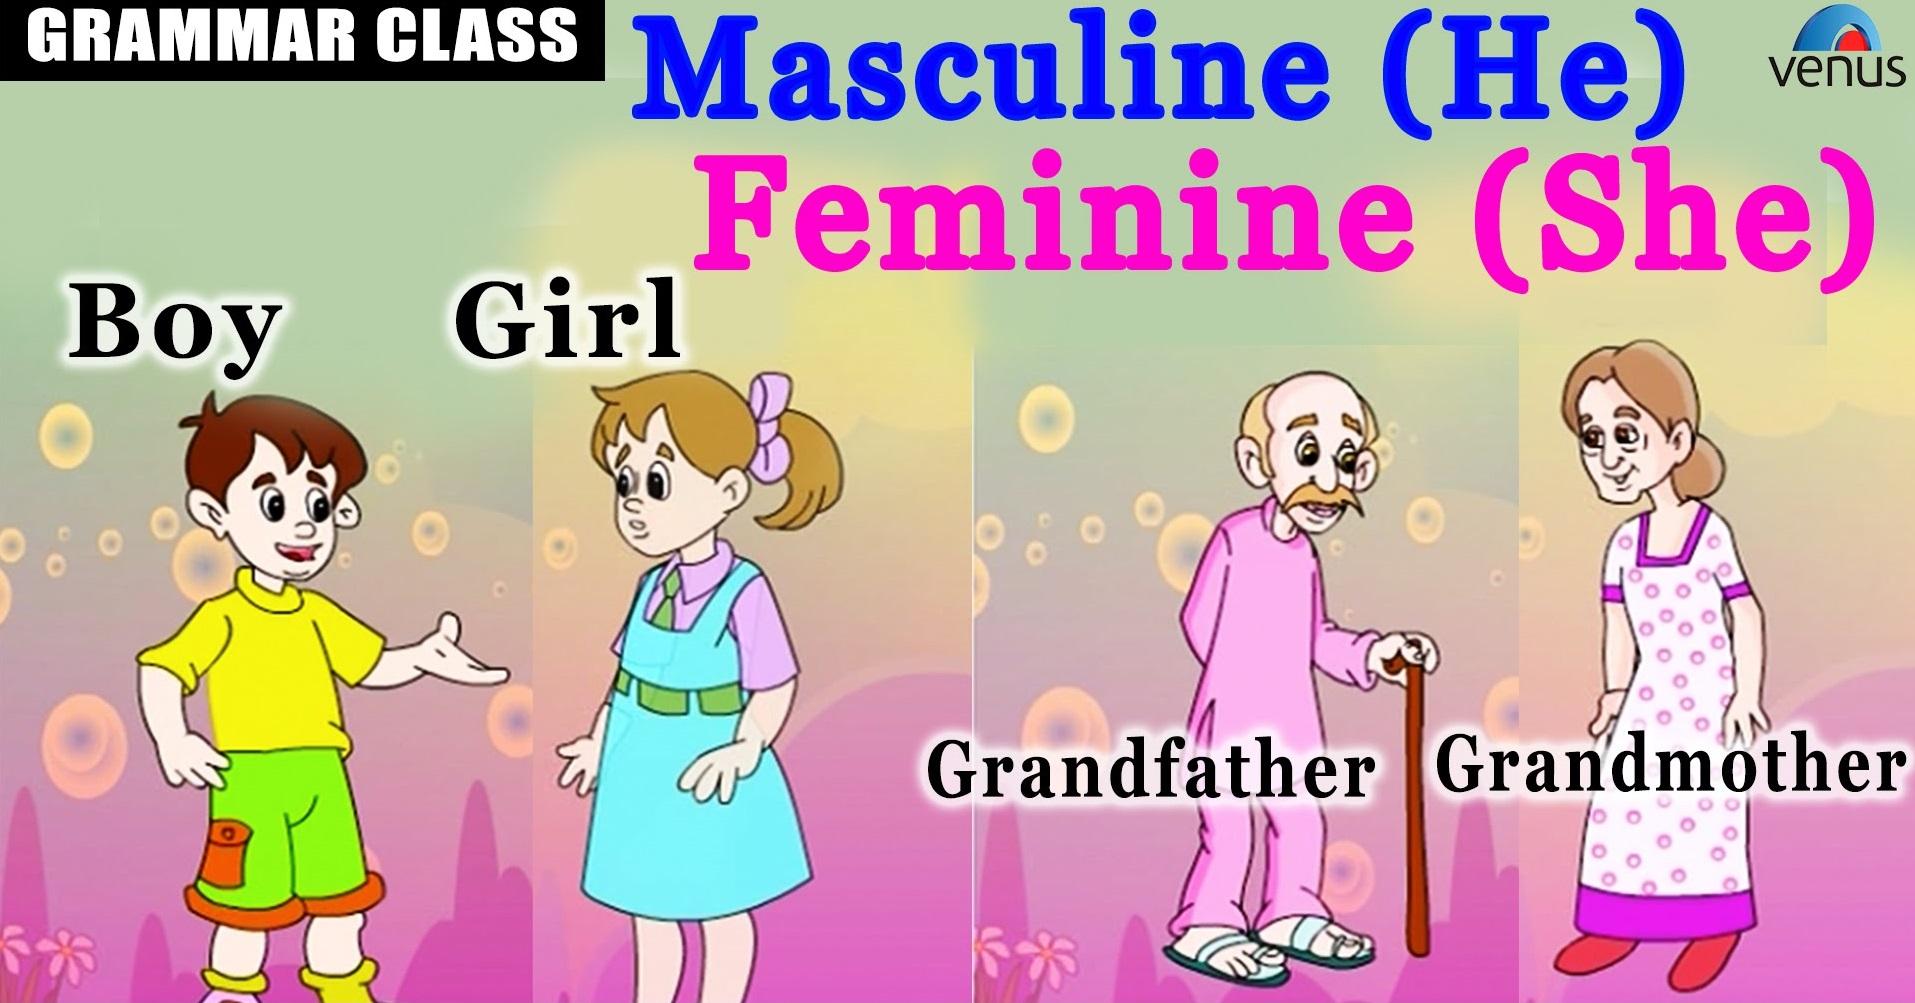 Masculine And Feminine Gender Nouns